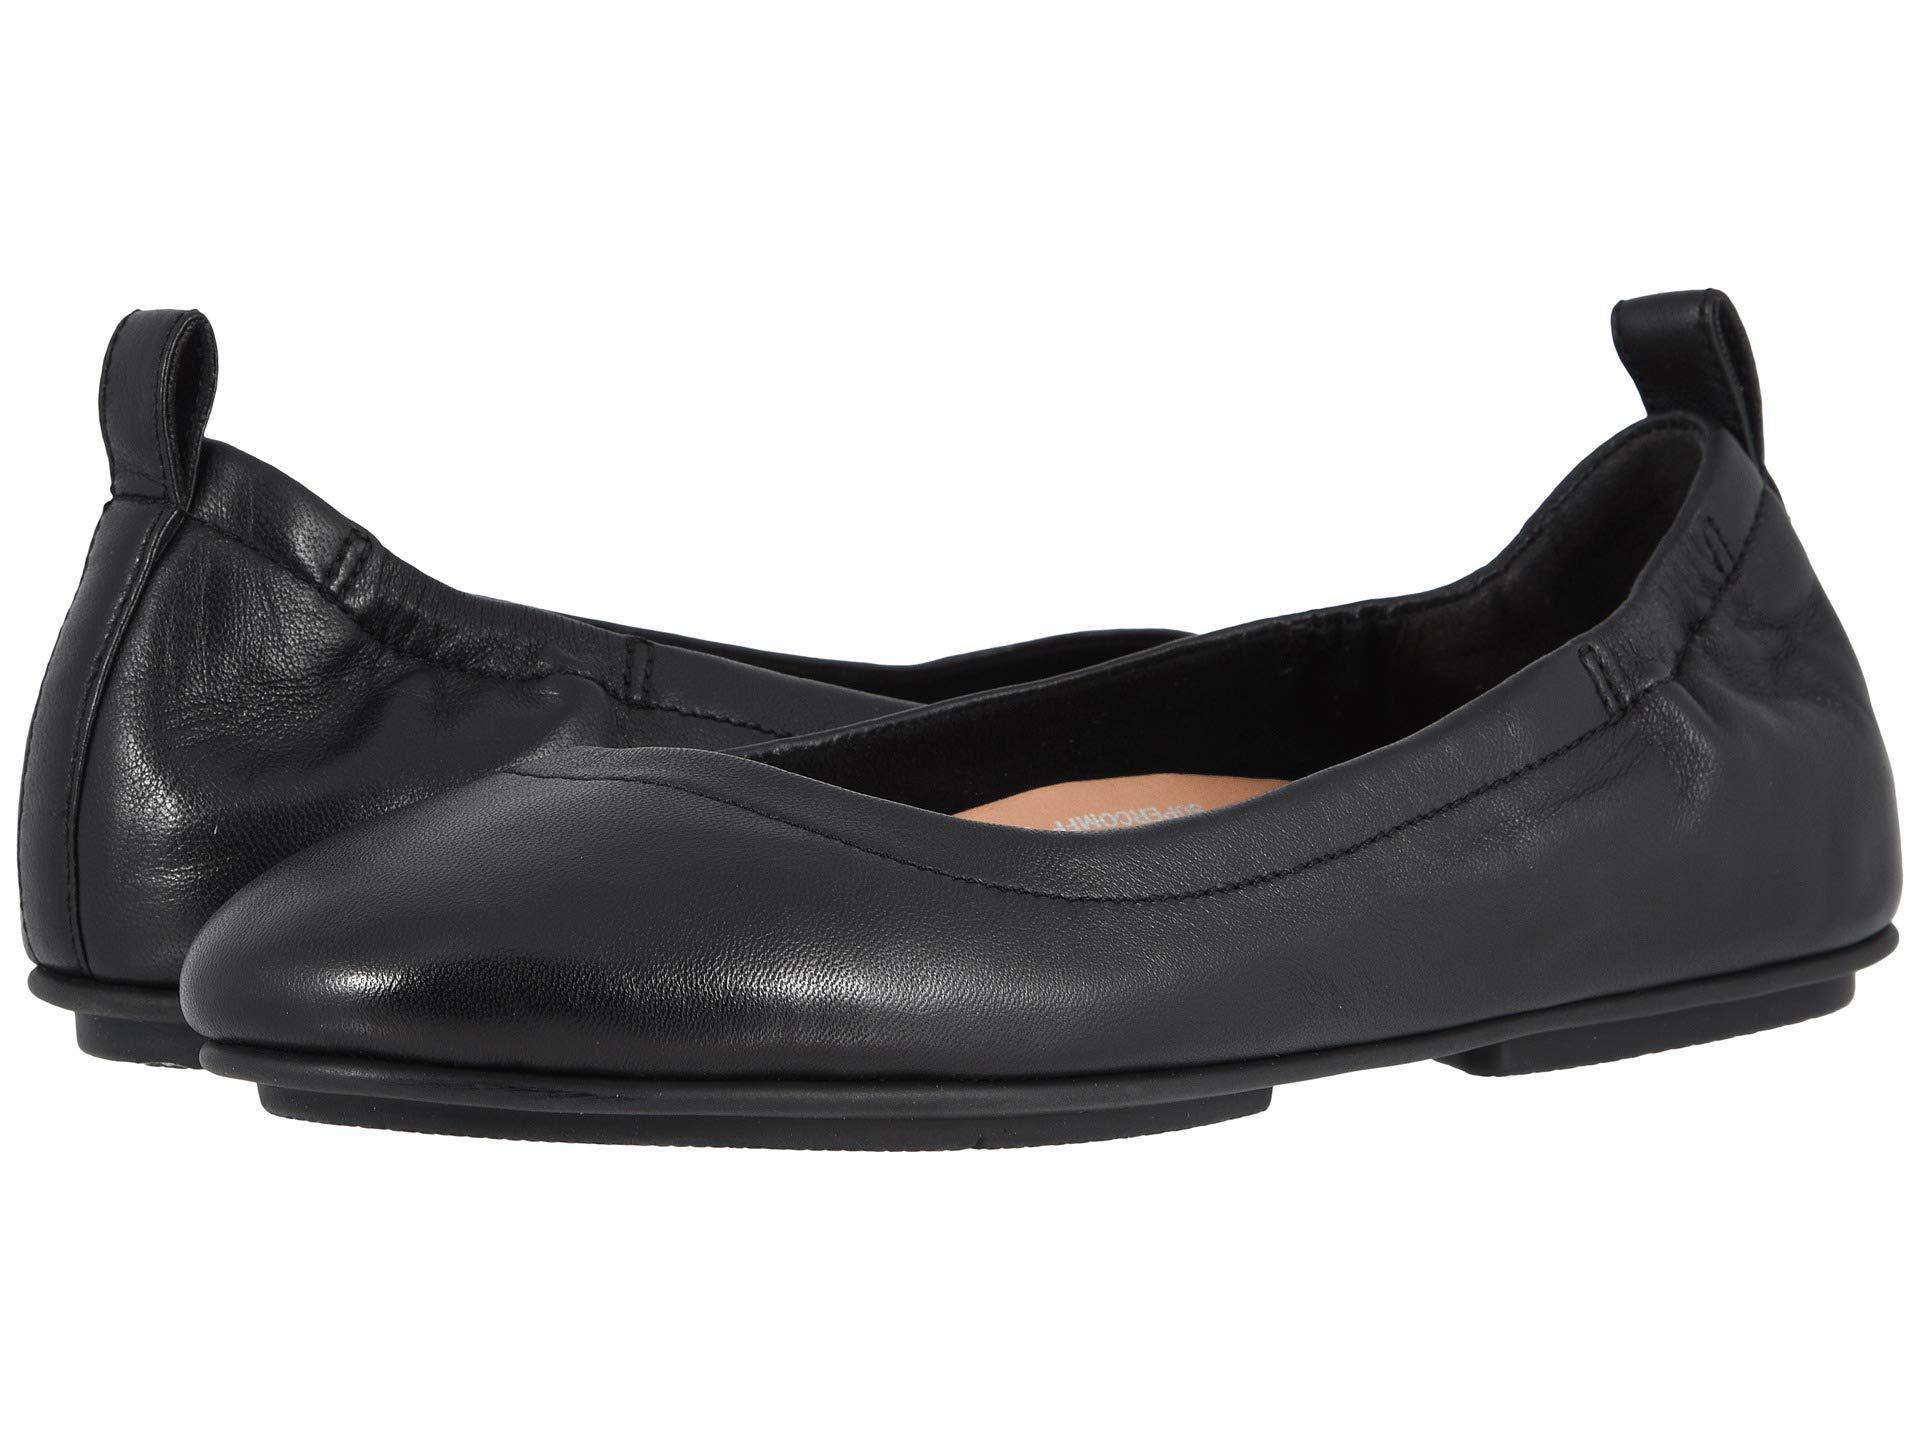 0208d799b2eb Lyst - Fitflop Allegro (black) Women s Flat Shoes in Black